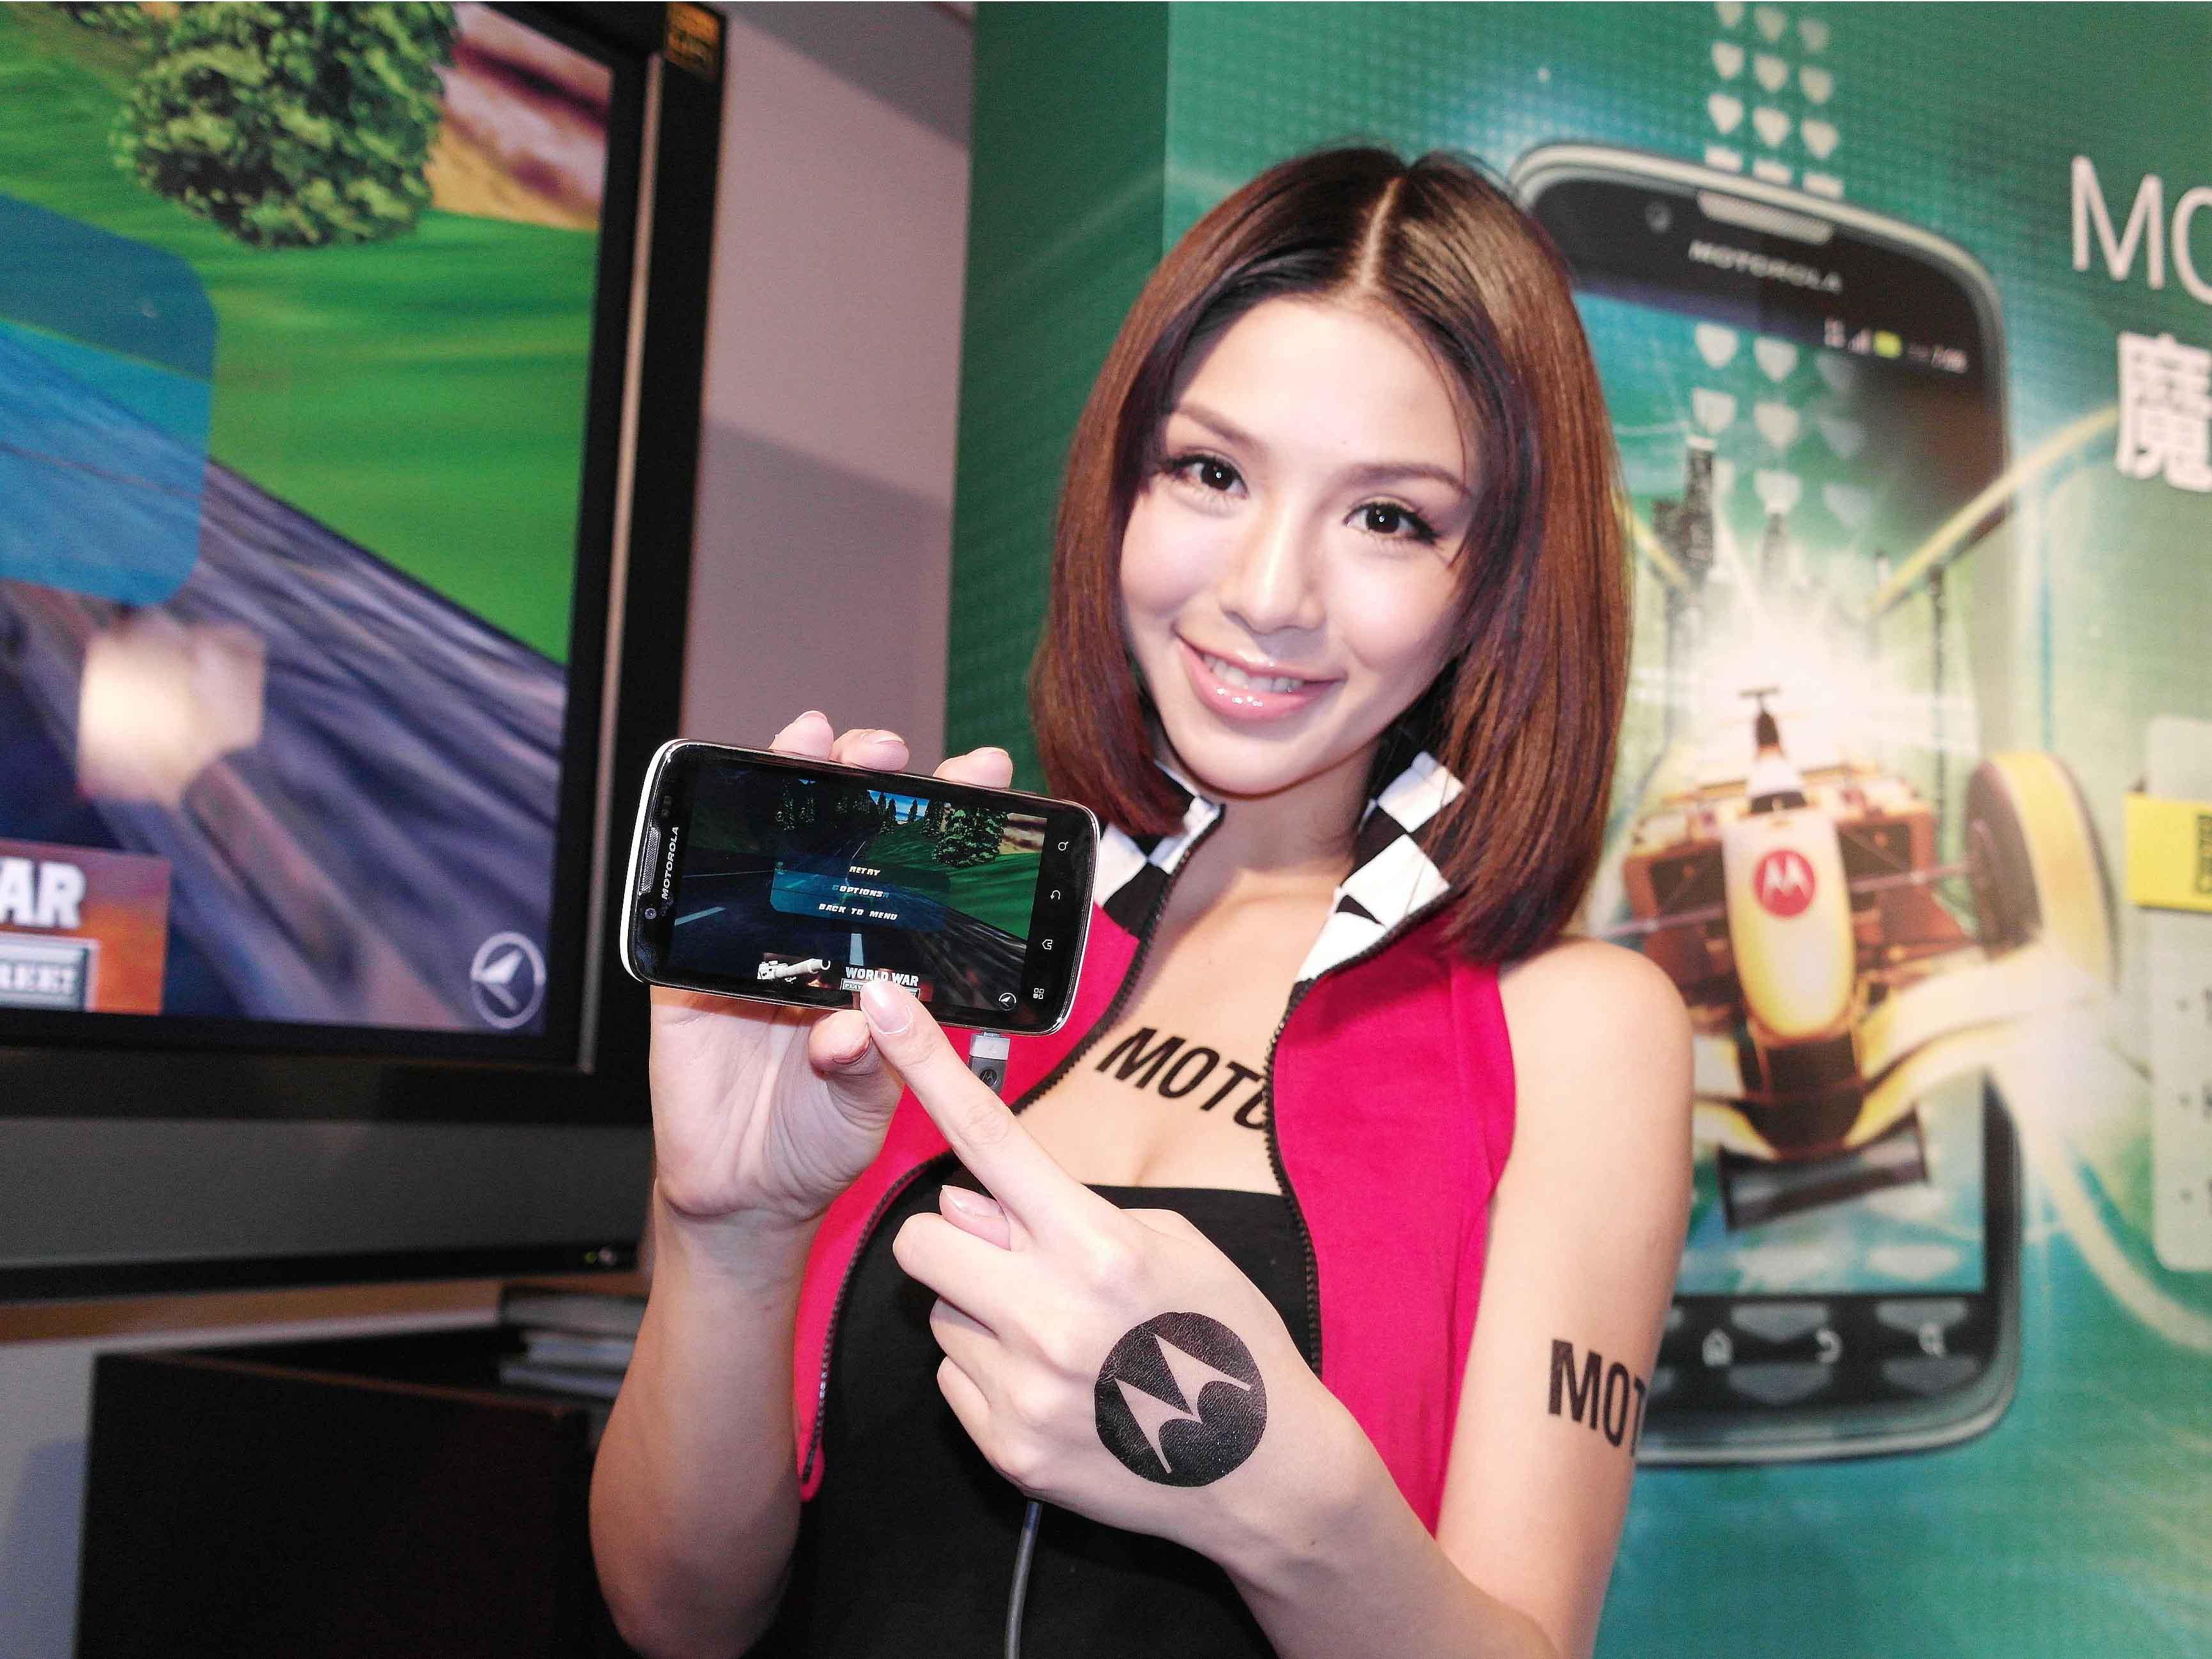 Motorola Atrix 二代 ME865、雙卡雙待機 XT532 聯袂現身